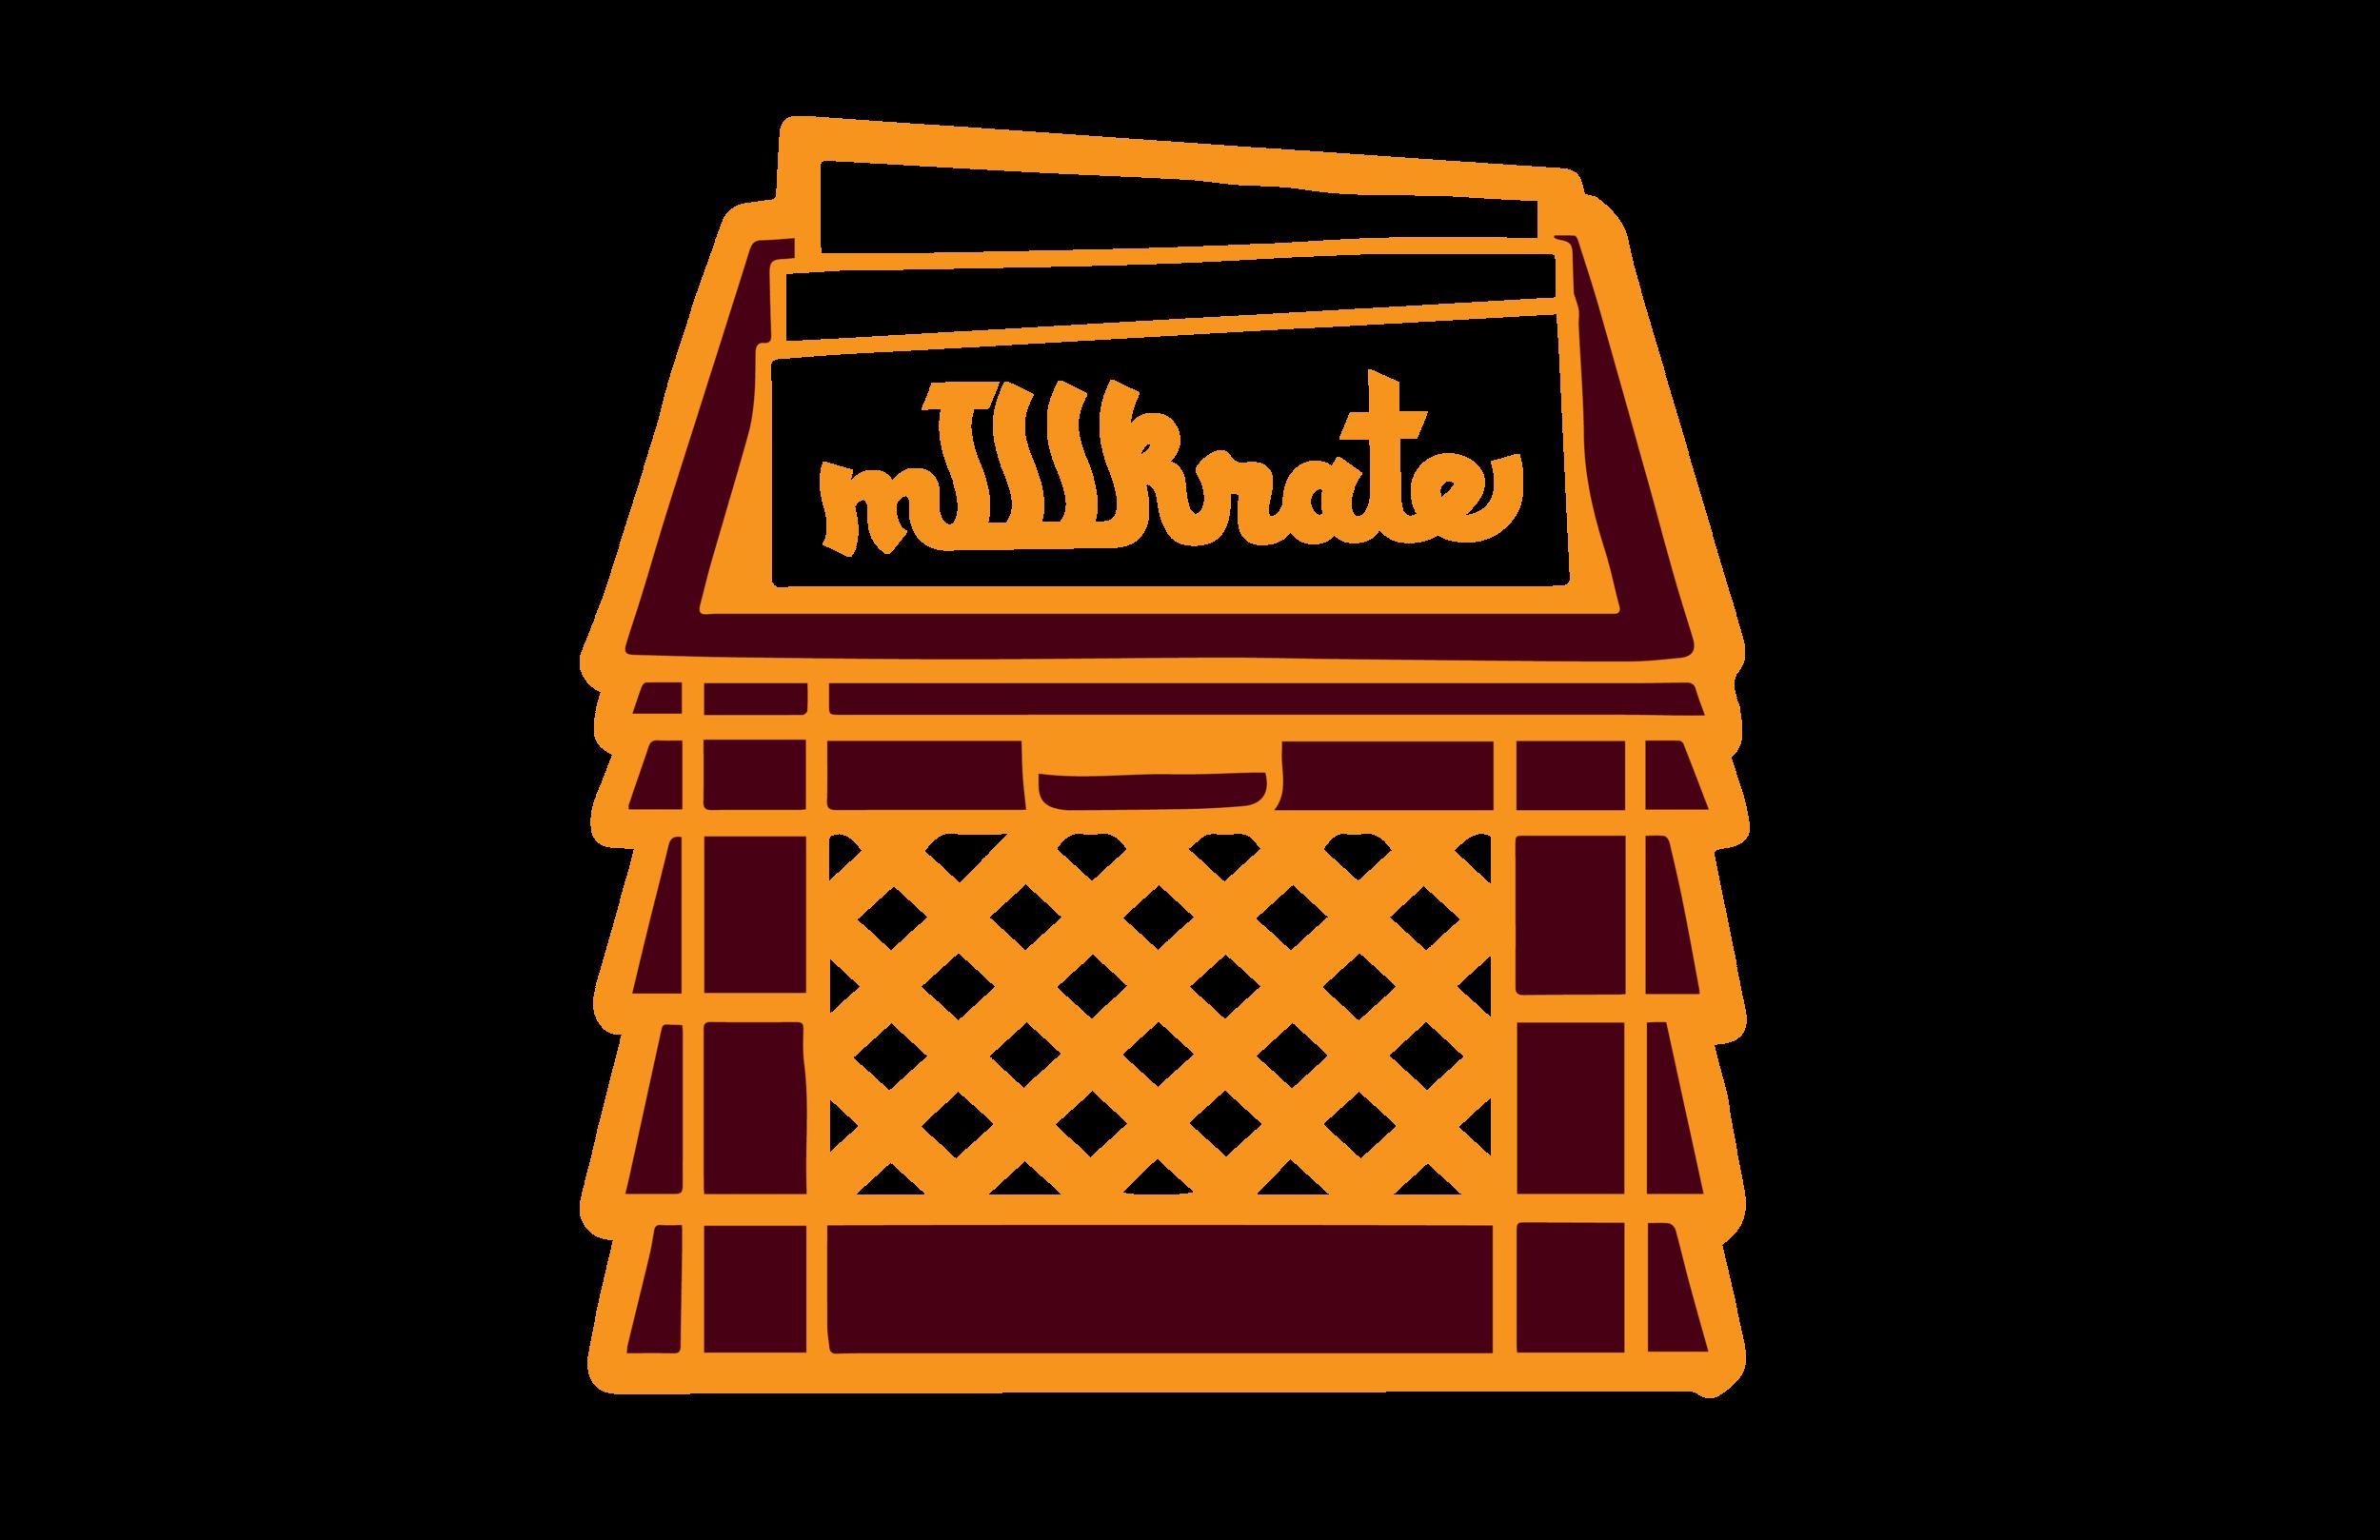 mILLkrate-Gold-Type-01_5000.png